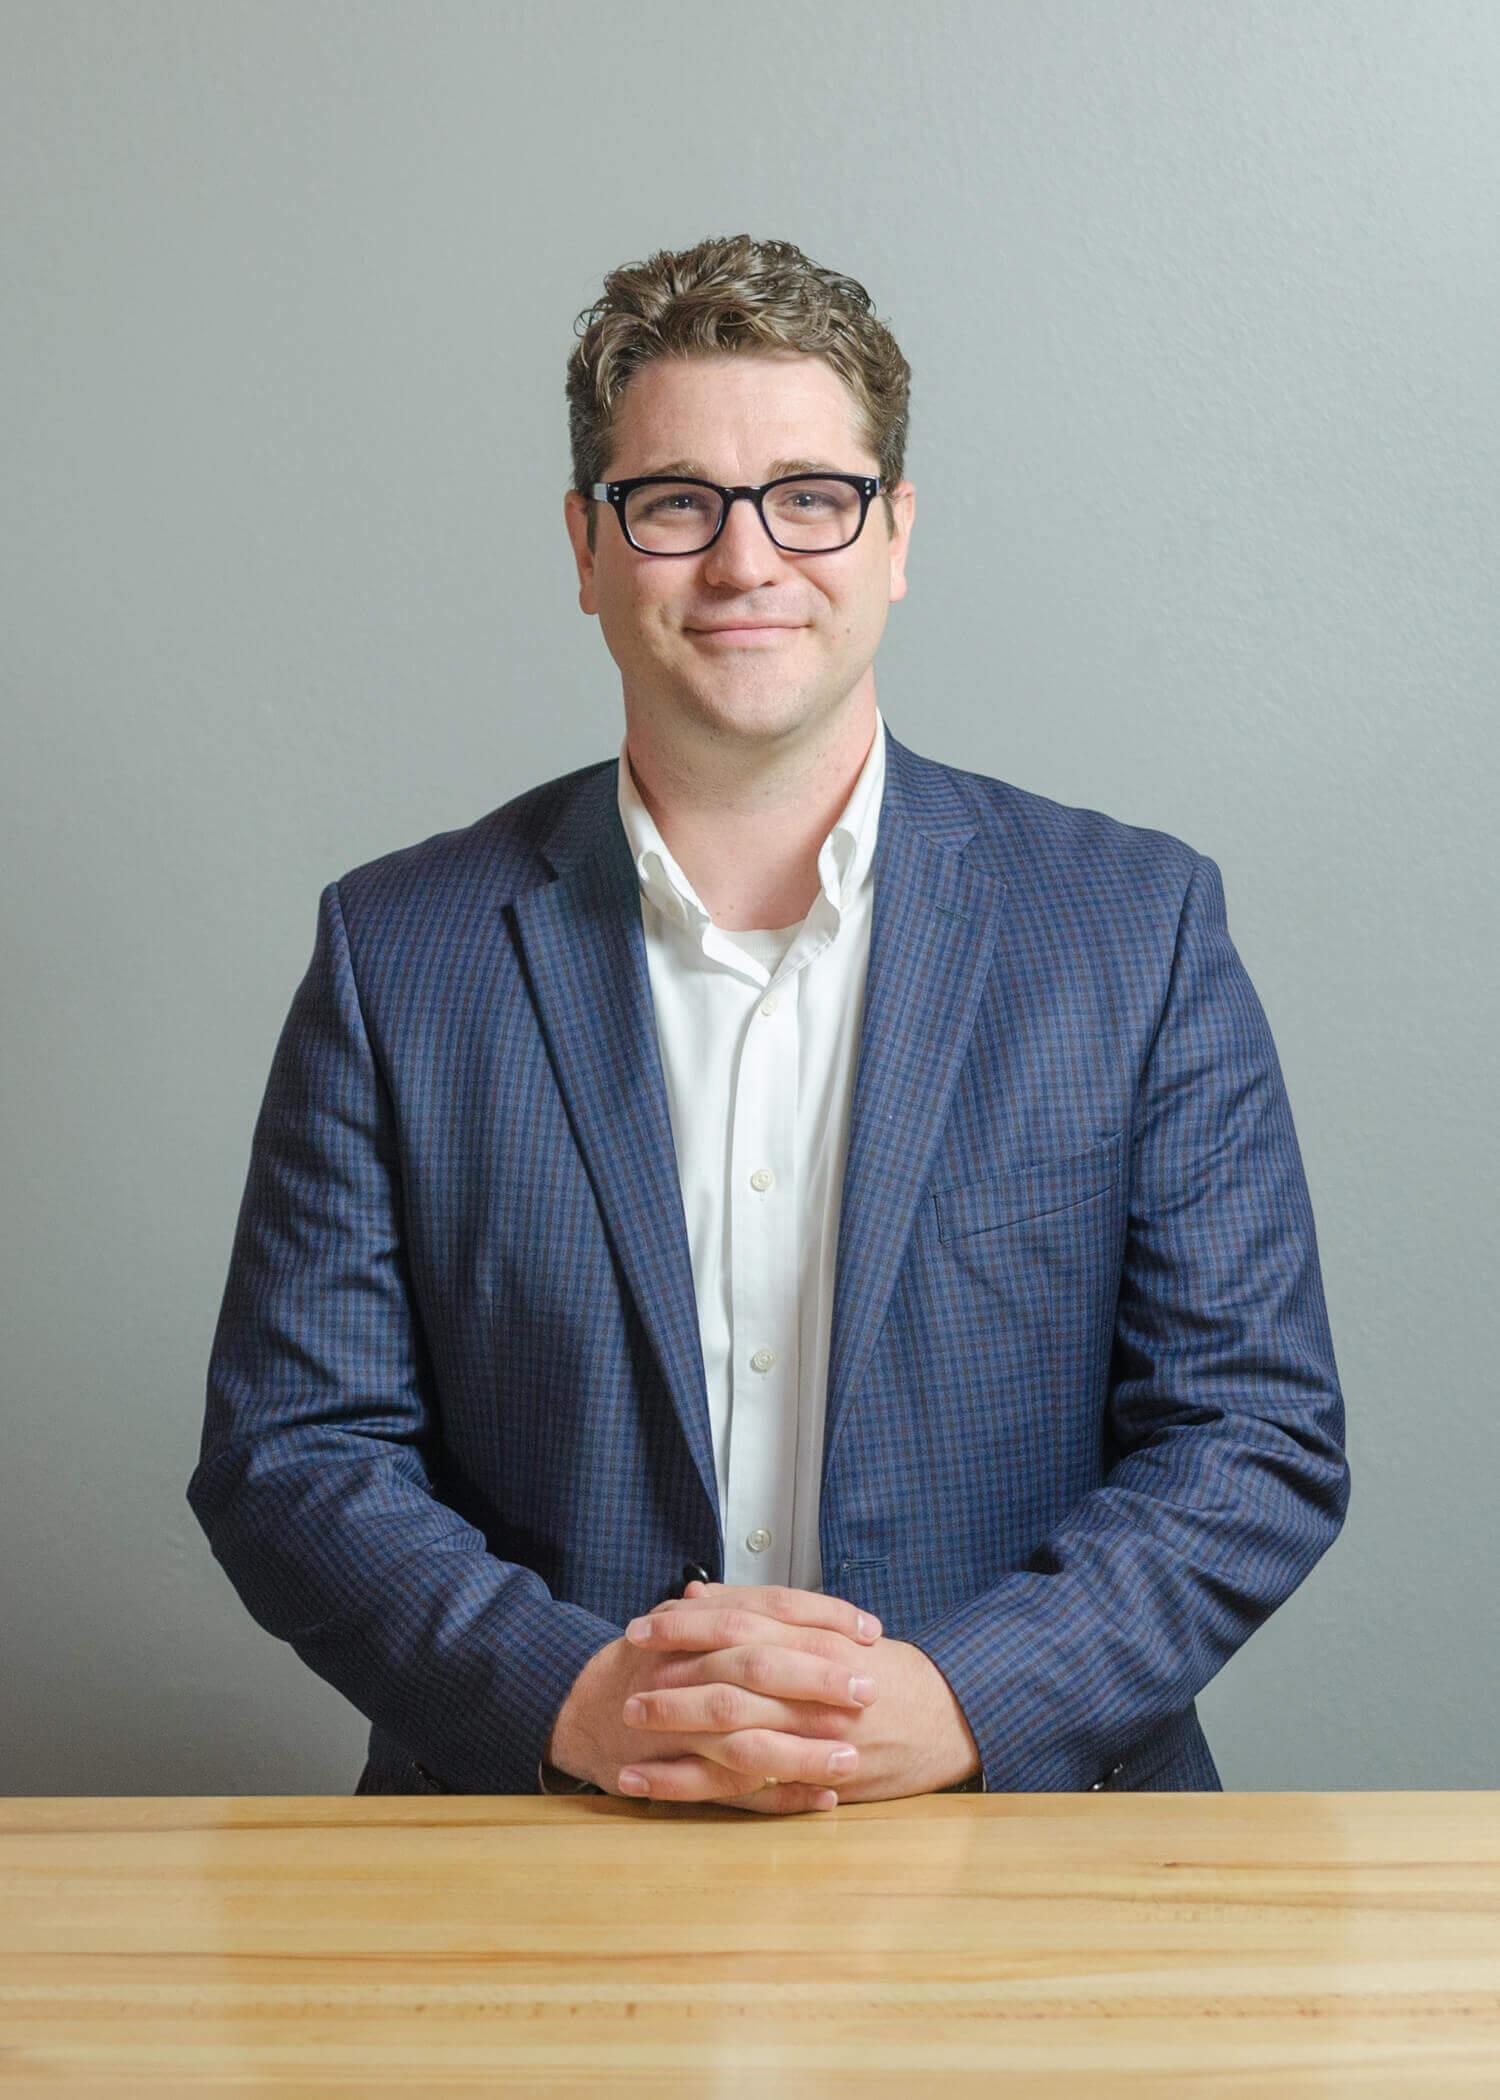 Director of Business Development